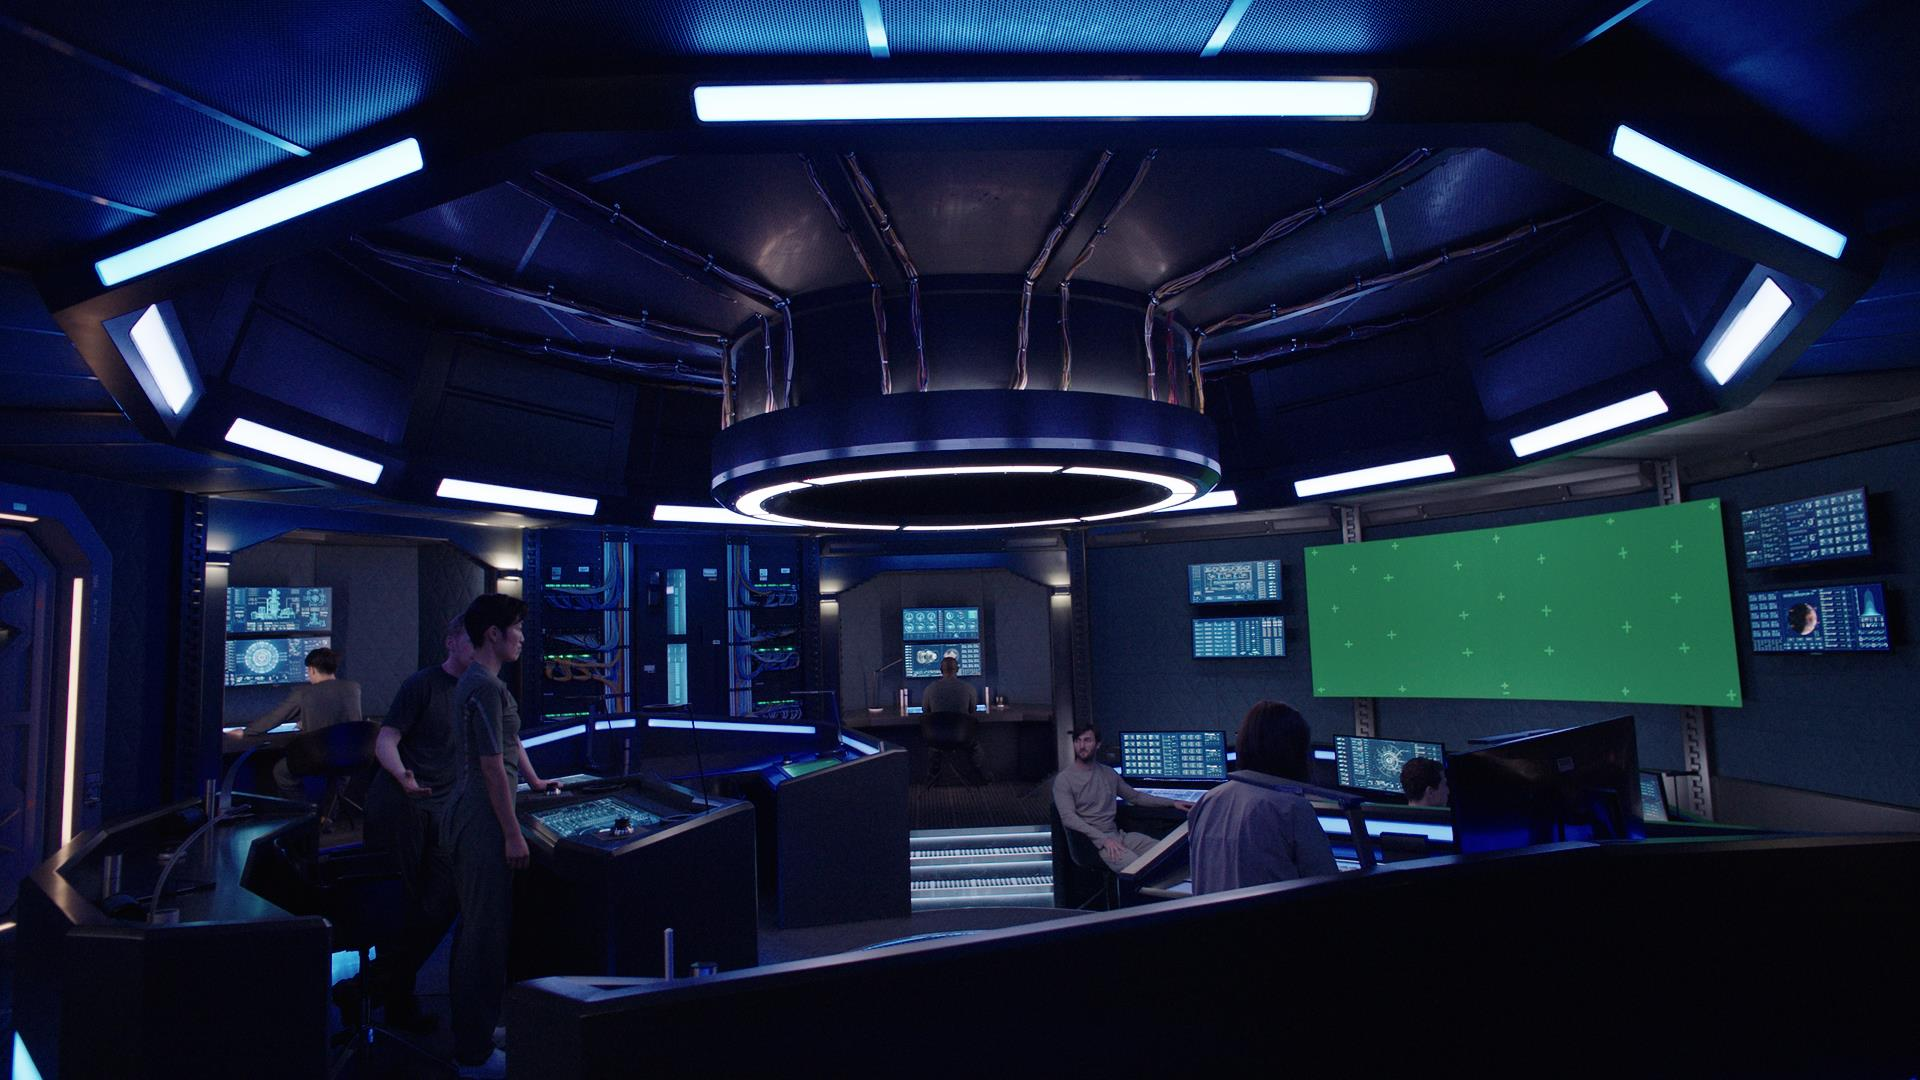 control centre imsf.2.jpg